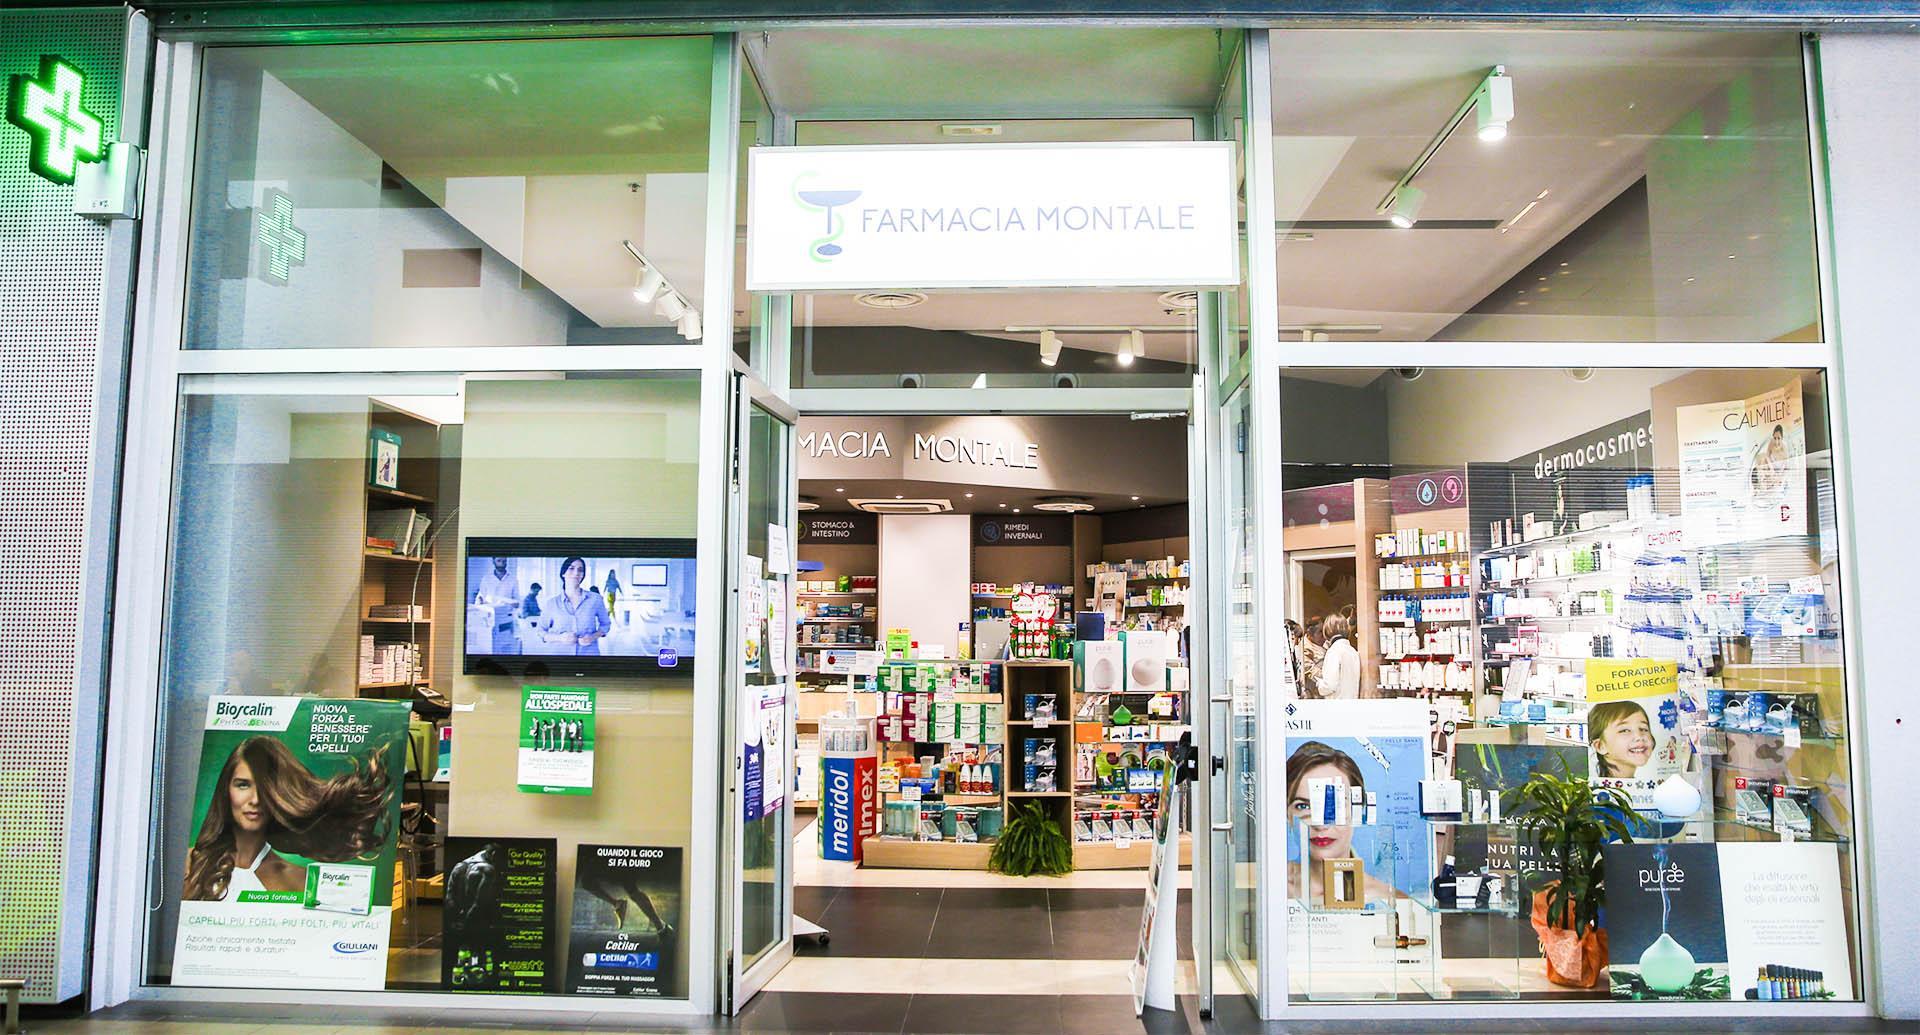 Farmacia Montale